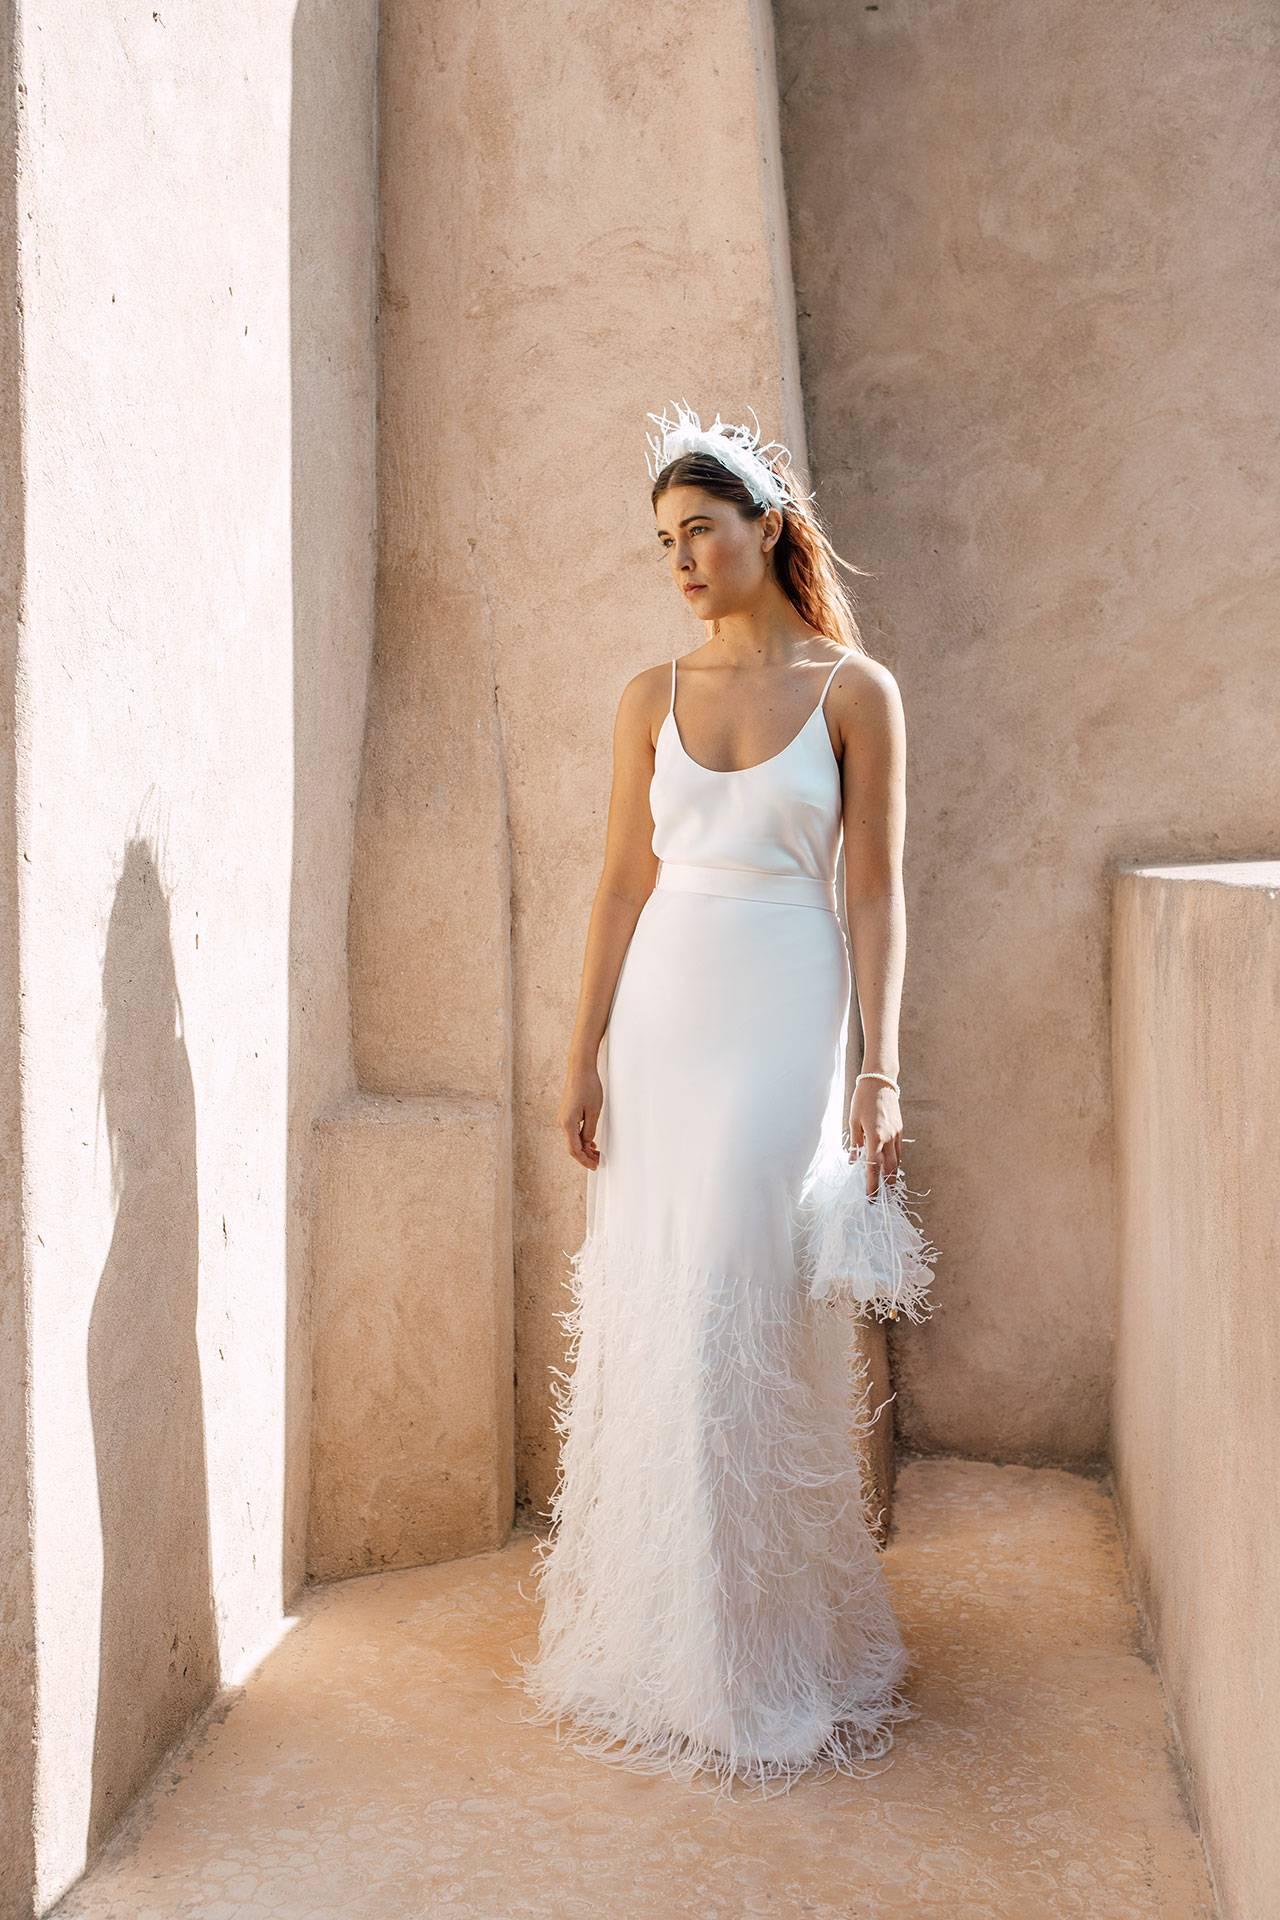 The Best Autumn Winter 2020 Wedding Dresses To Buy Now Tatler